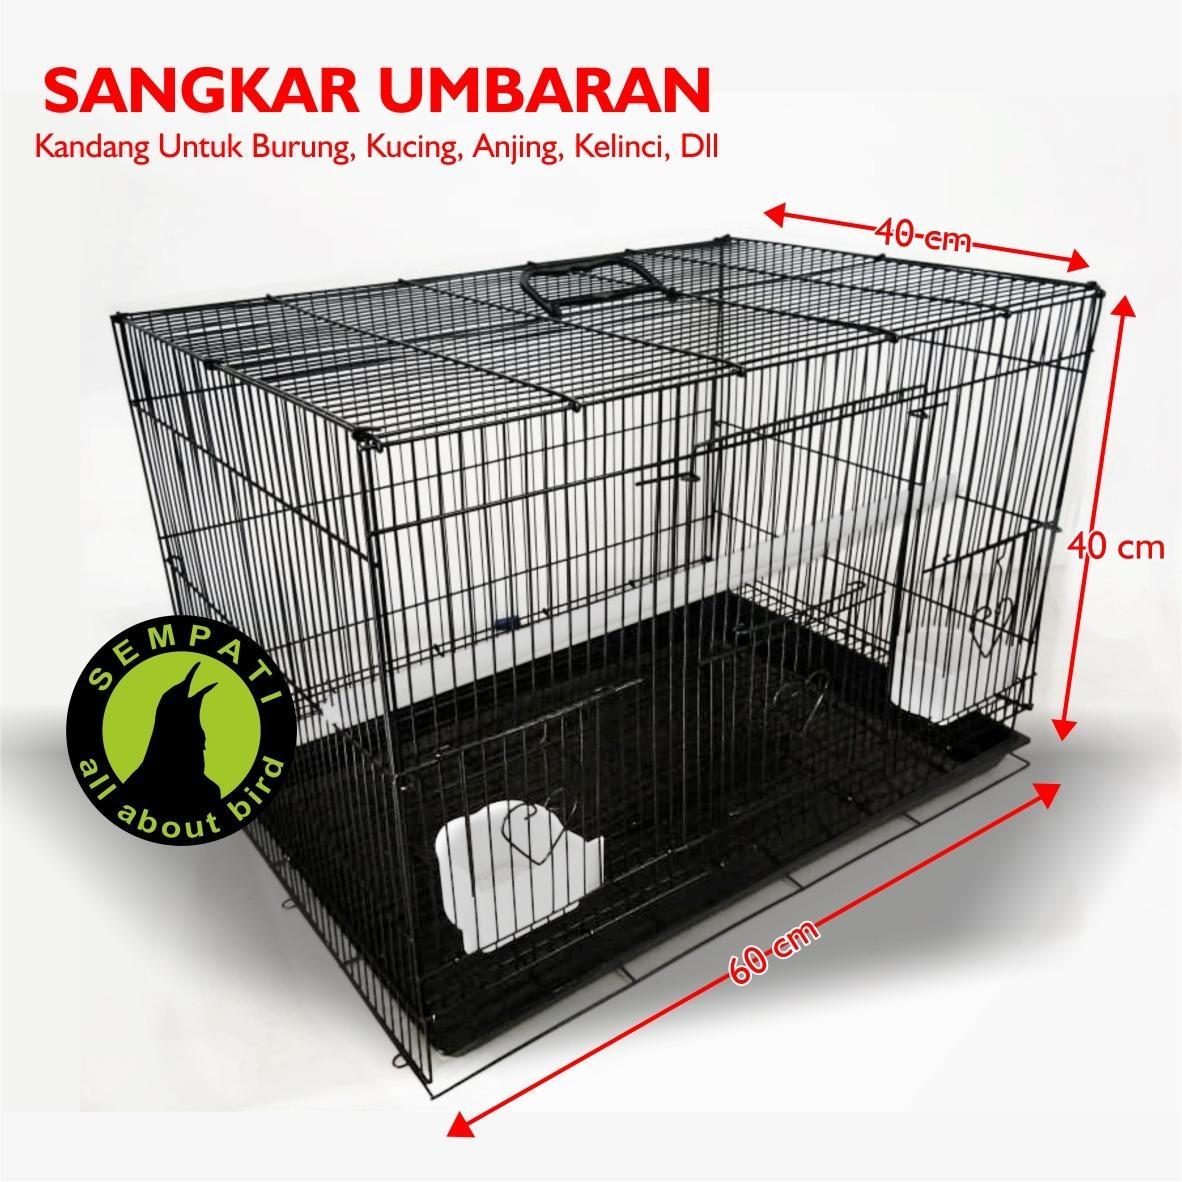 Sangkar Kandang Besi Umbaran Tebal Lipat Kotak Untuk Ternak Burung Lovebird Kucing Kelinci Anjing